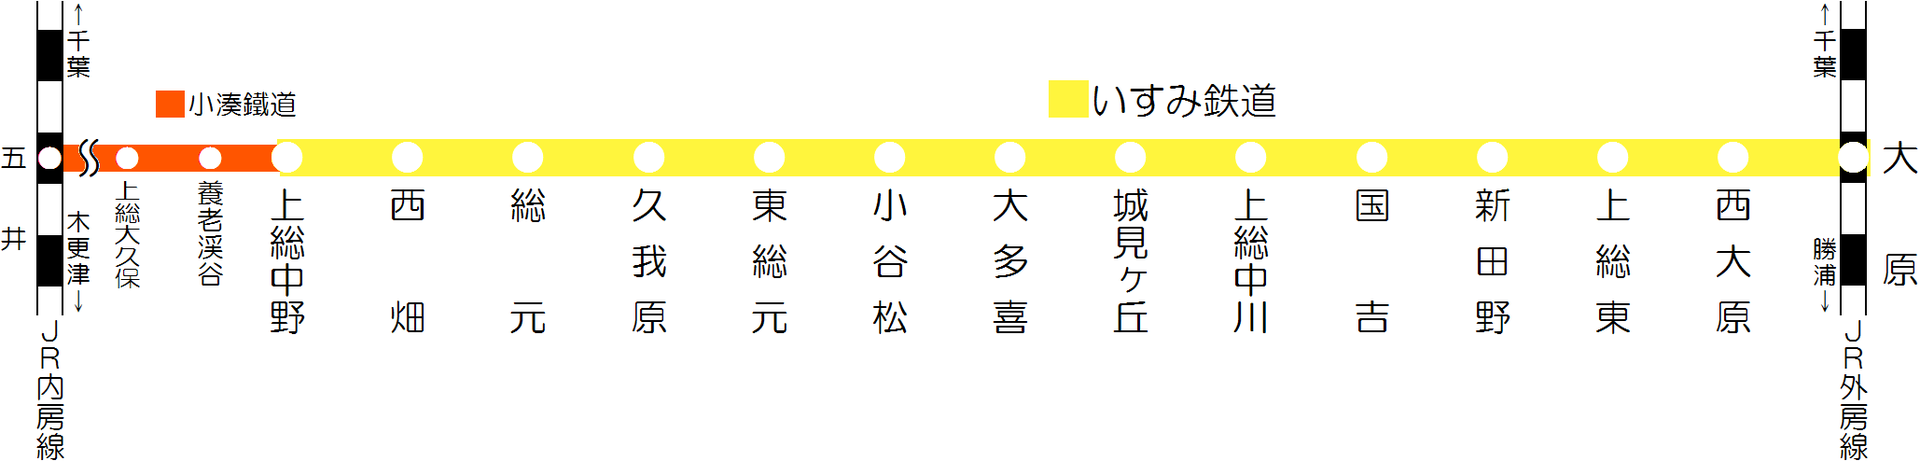 1920px-Linemap_of_Isumi_Railway_Isumi_line